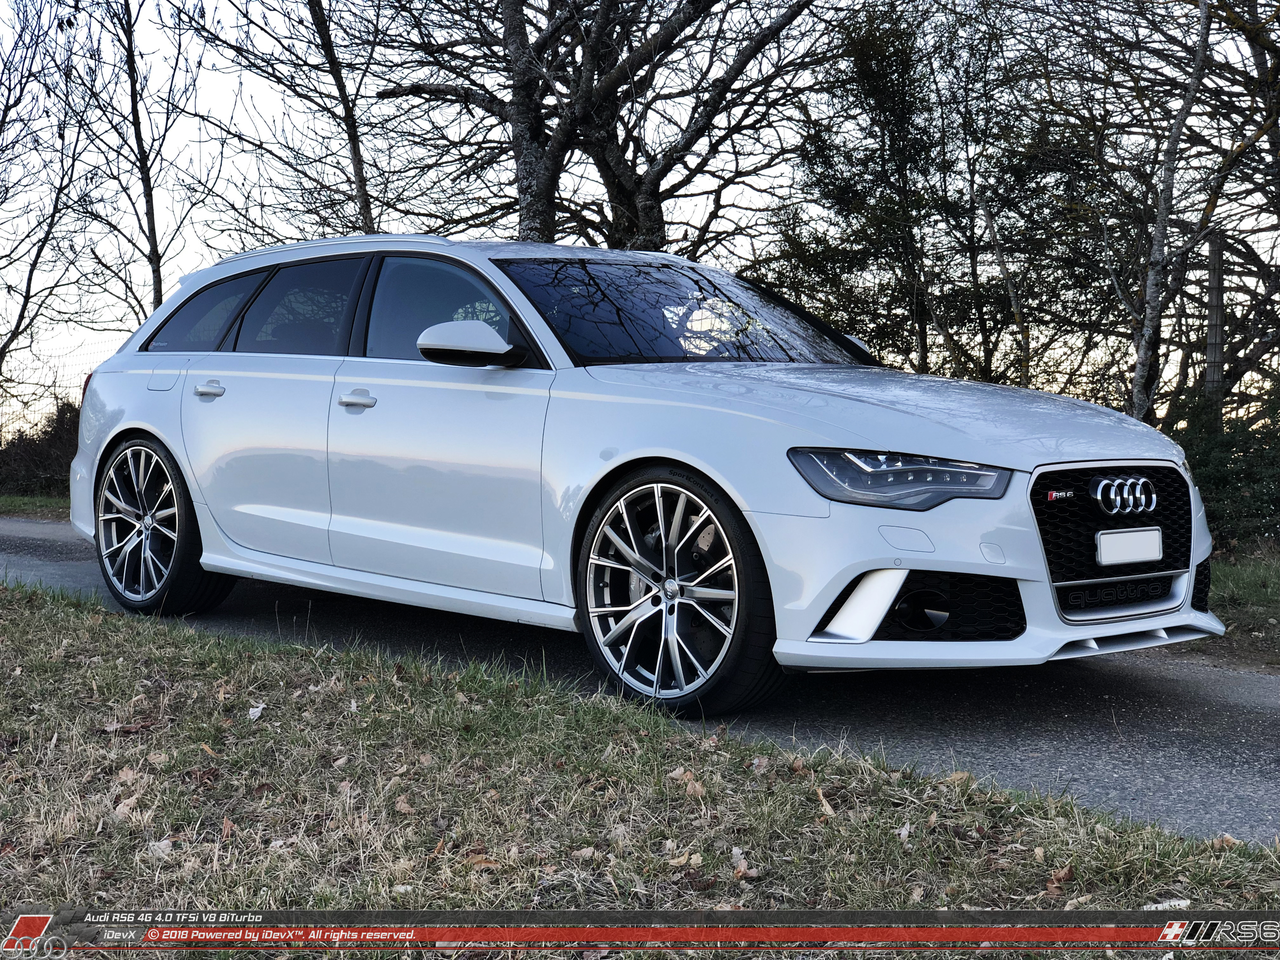 22_02.2019_Audi-RS6_iDevX_004.png